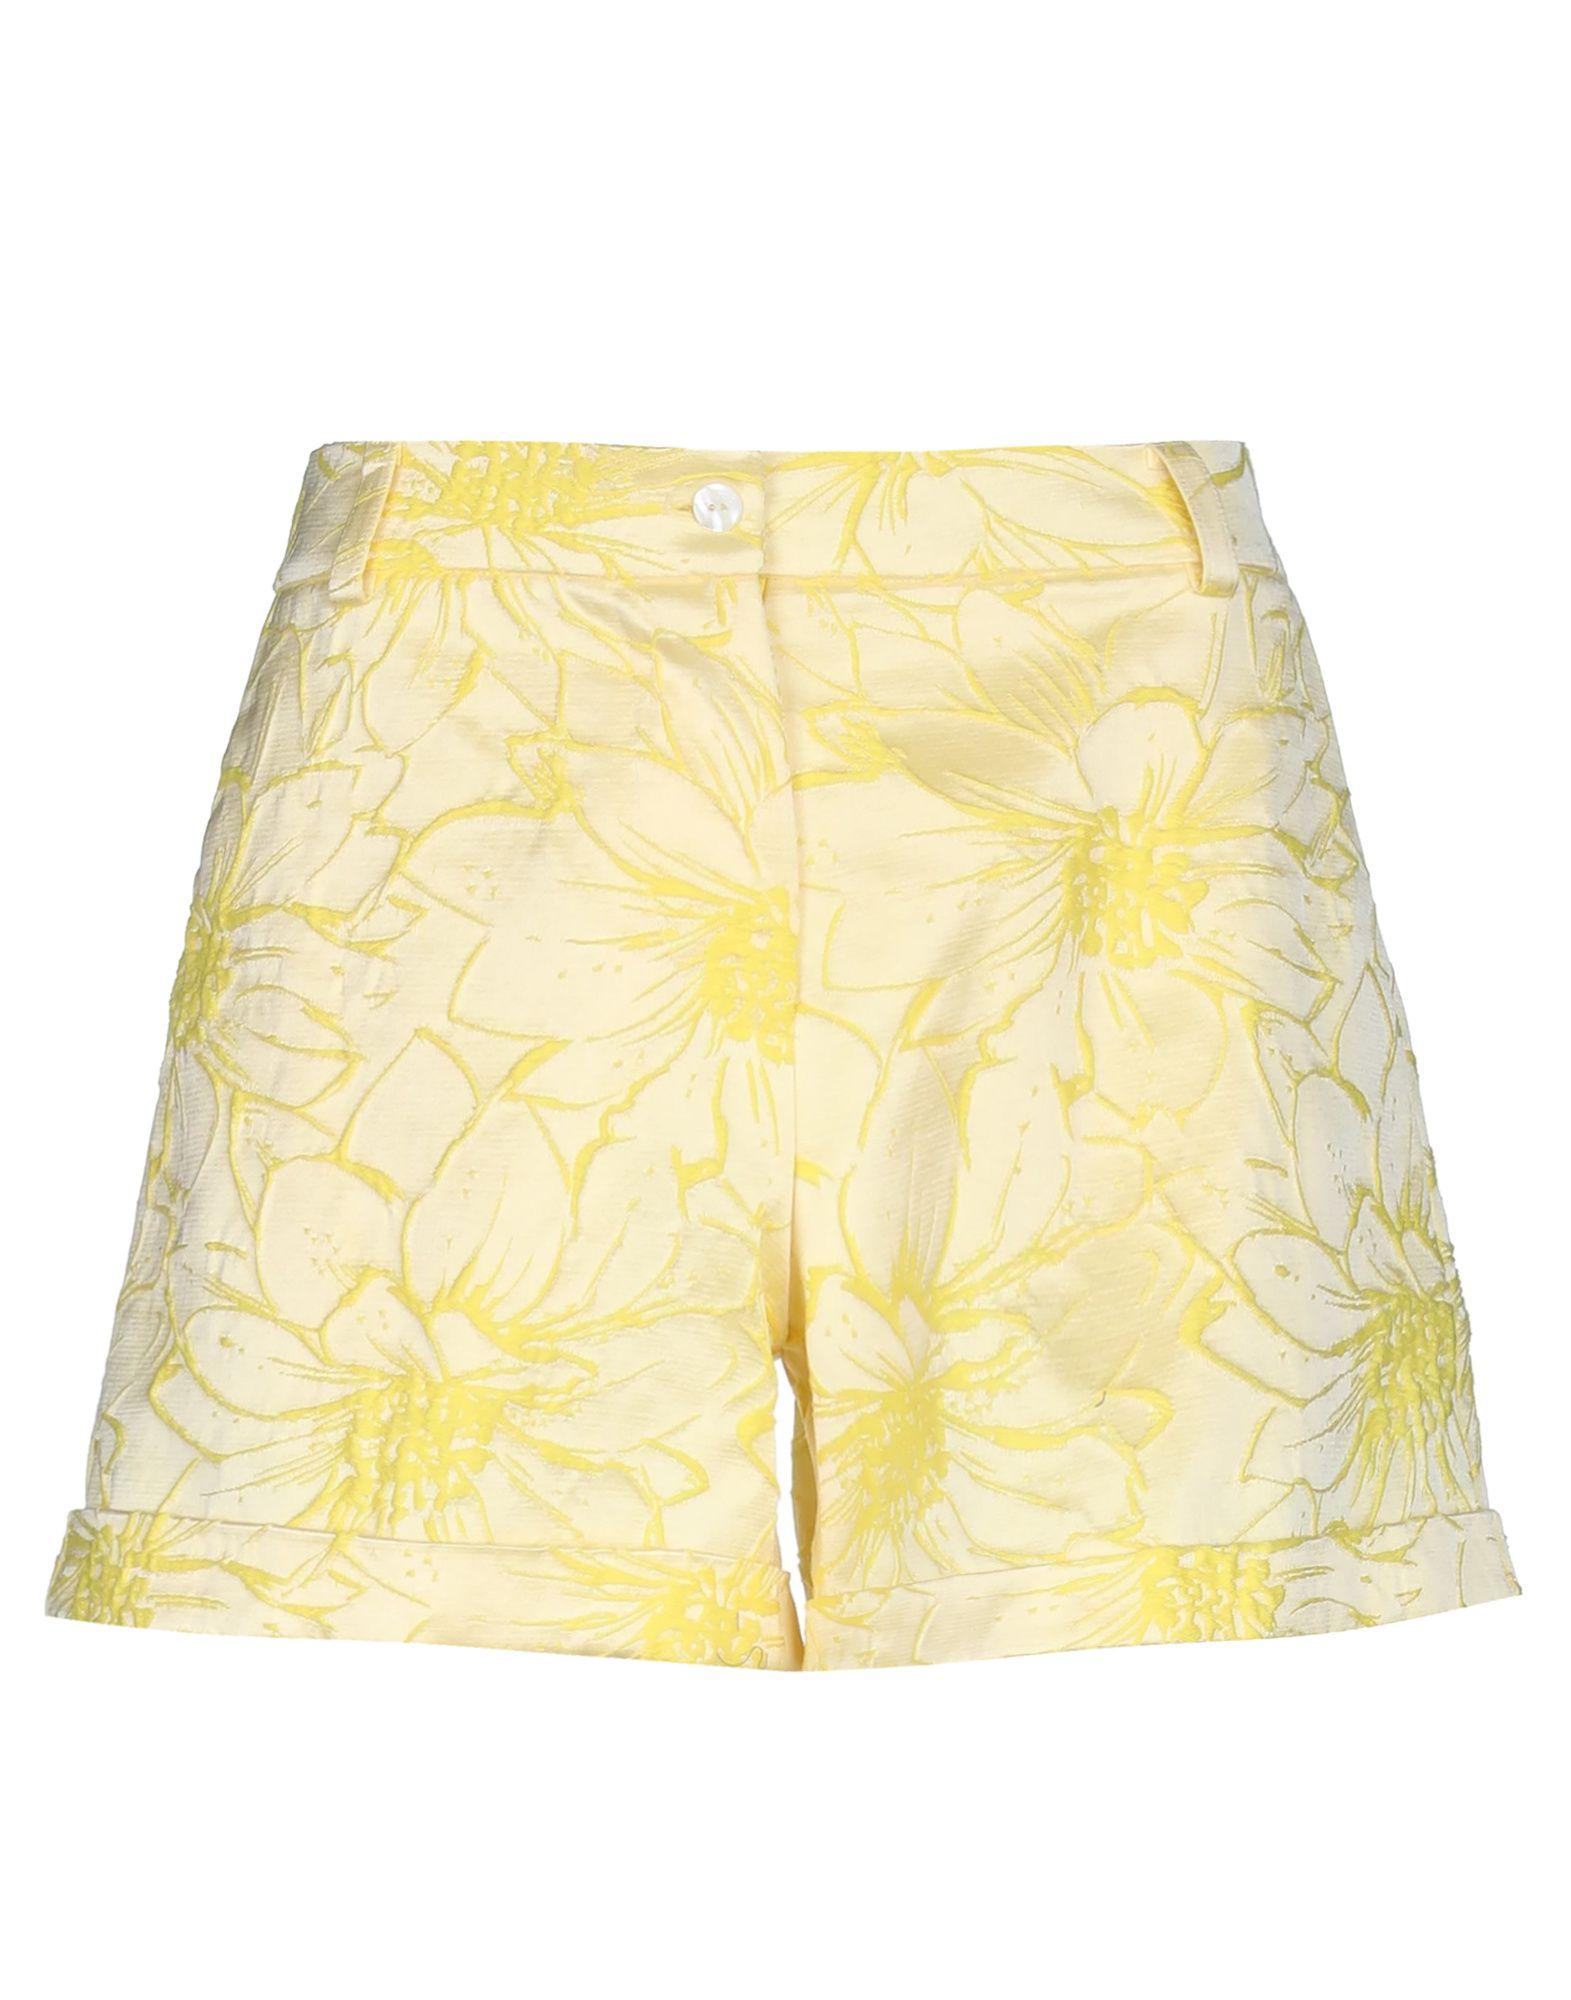 BLUGIRL BLUMARINE Повседневные шорты blugirl blumarine beachwear пляжные брюки и шорты